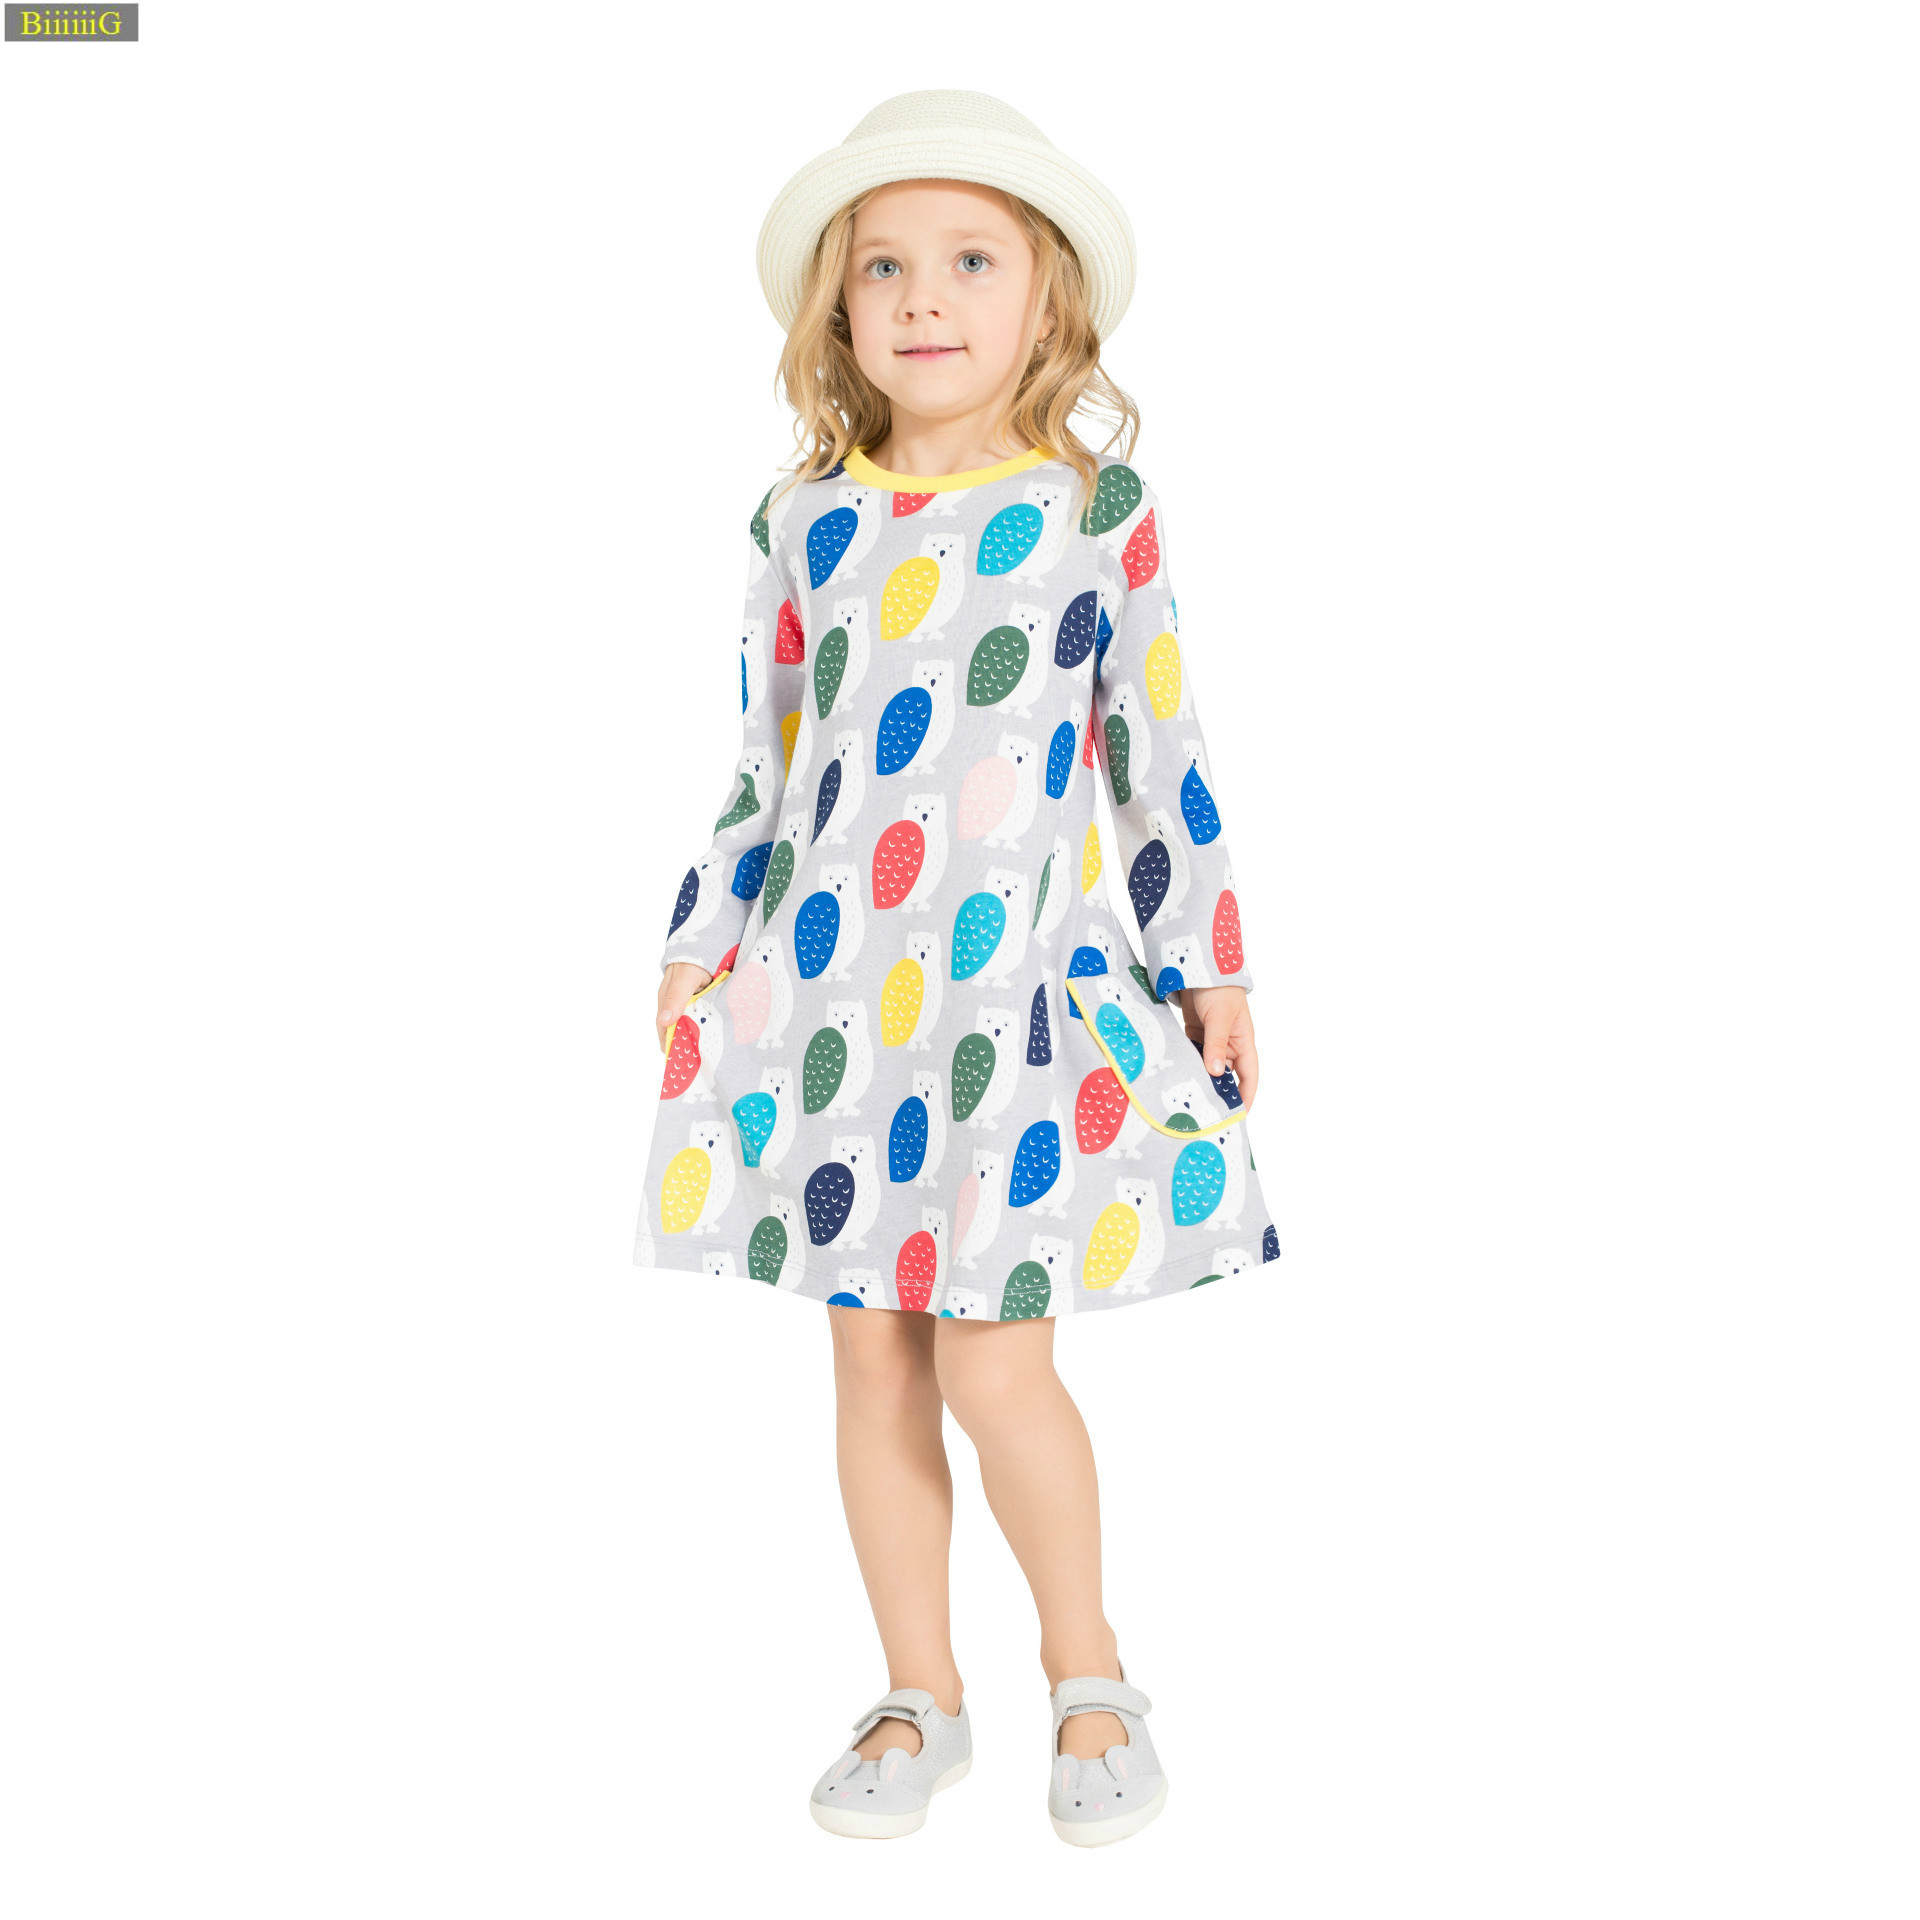 Little Bitty pure cotton children dress baby girl dinosaur dress summer dresses for girls party dress girl toddler kids clothes baby girl casual dress summer pure cotton 100